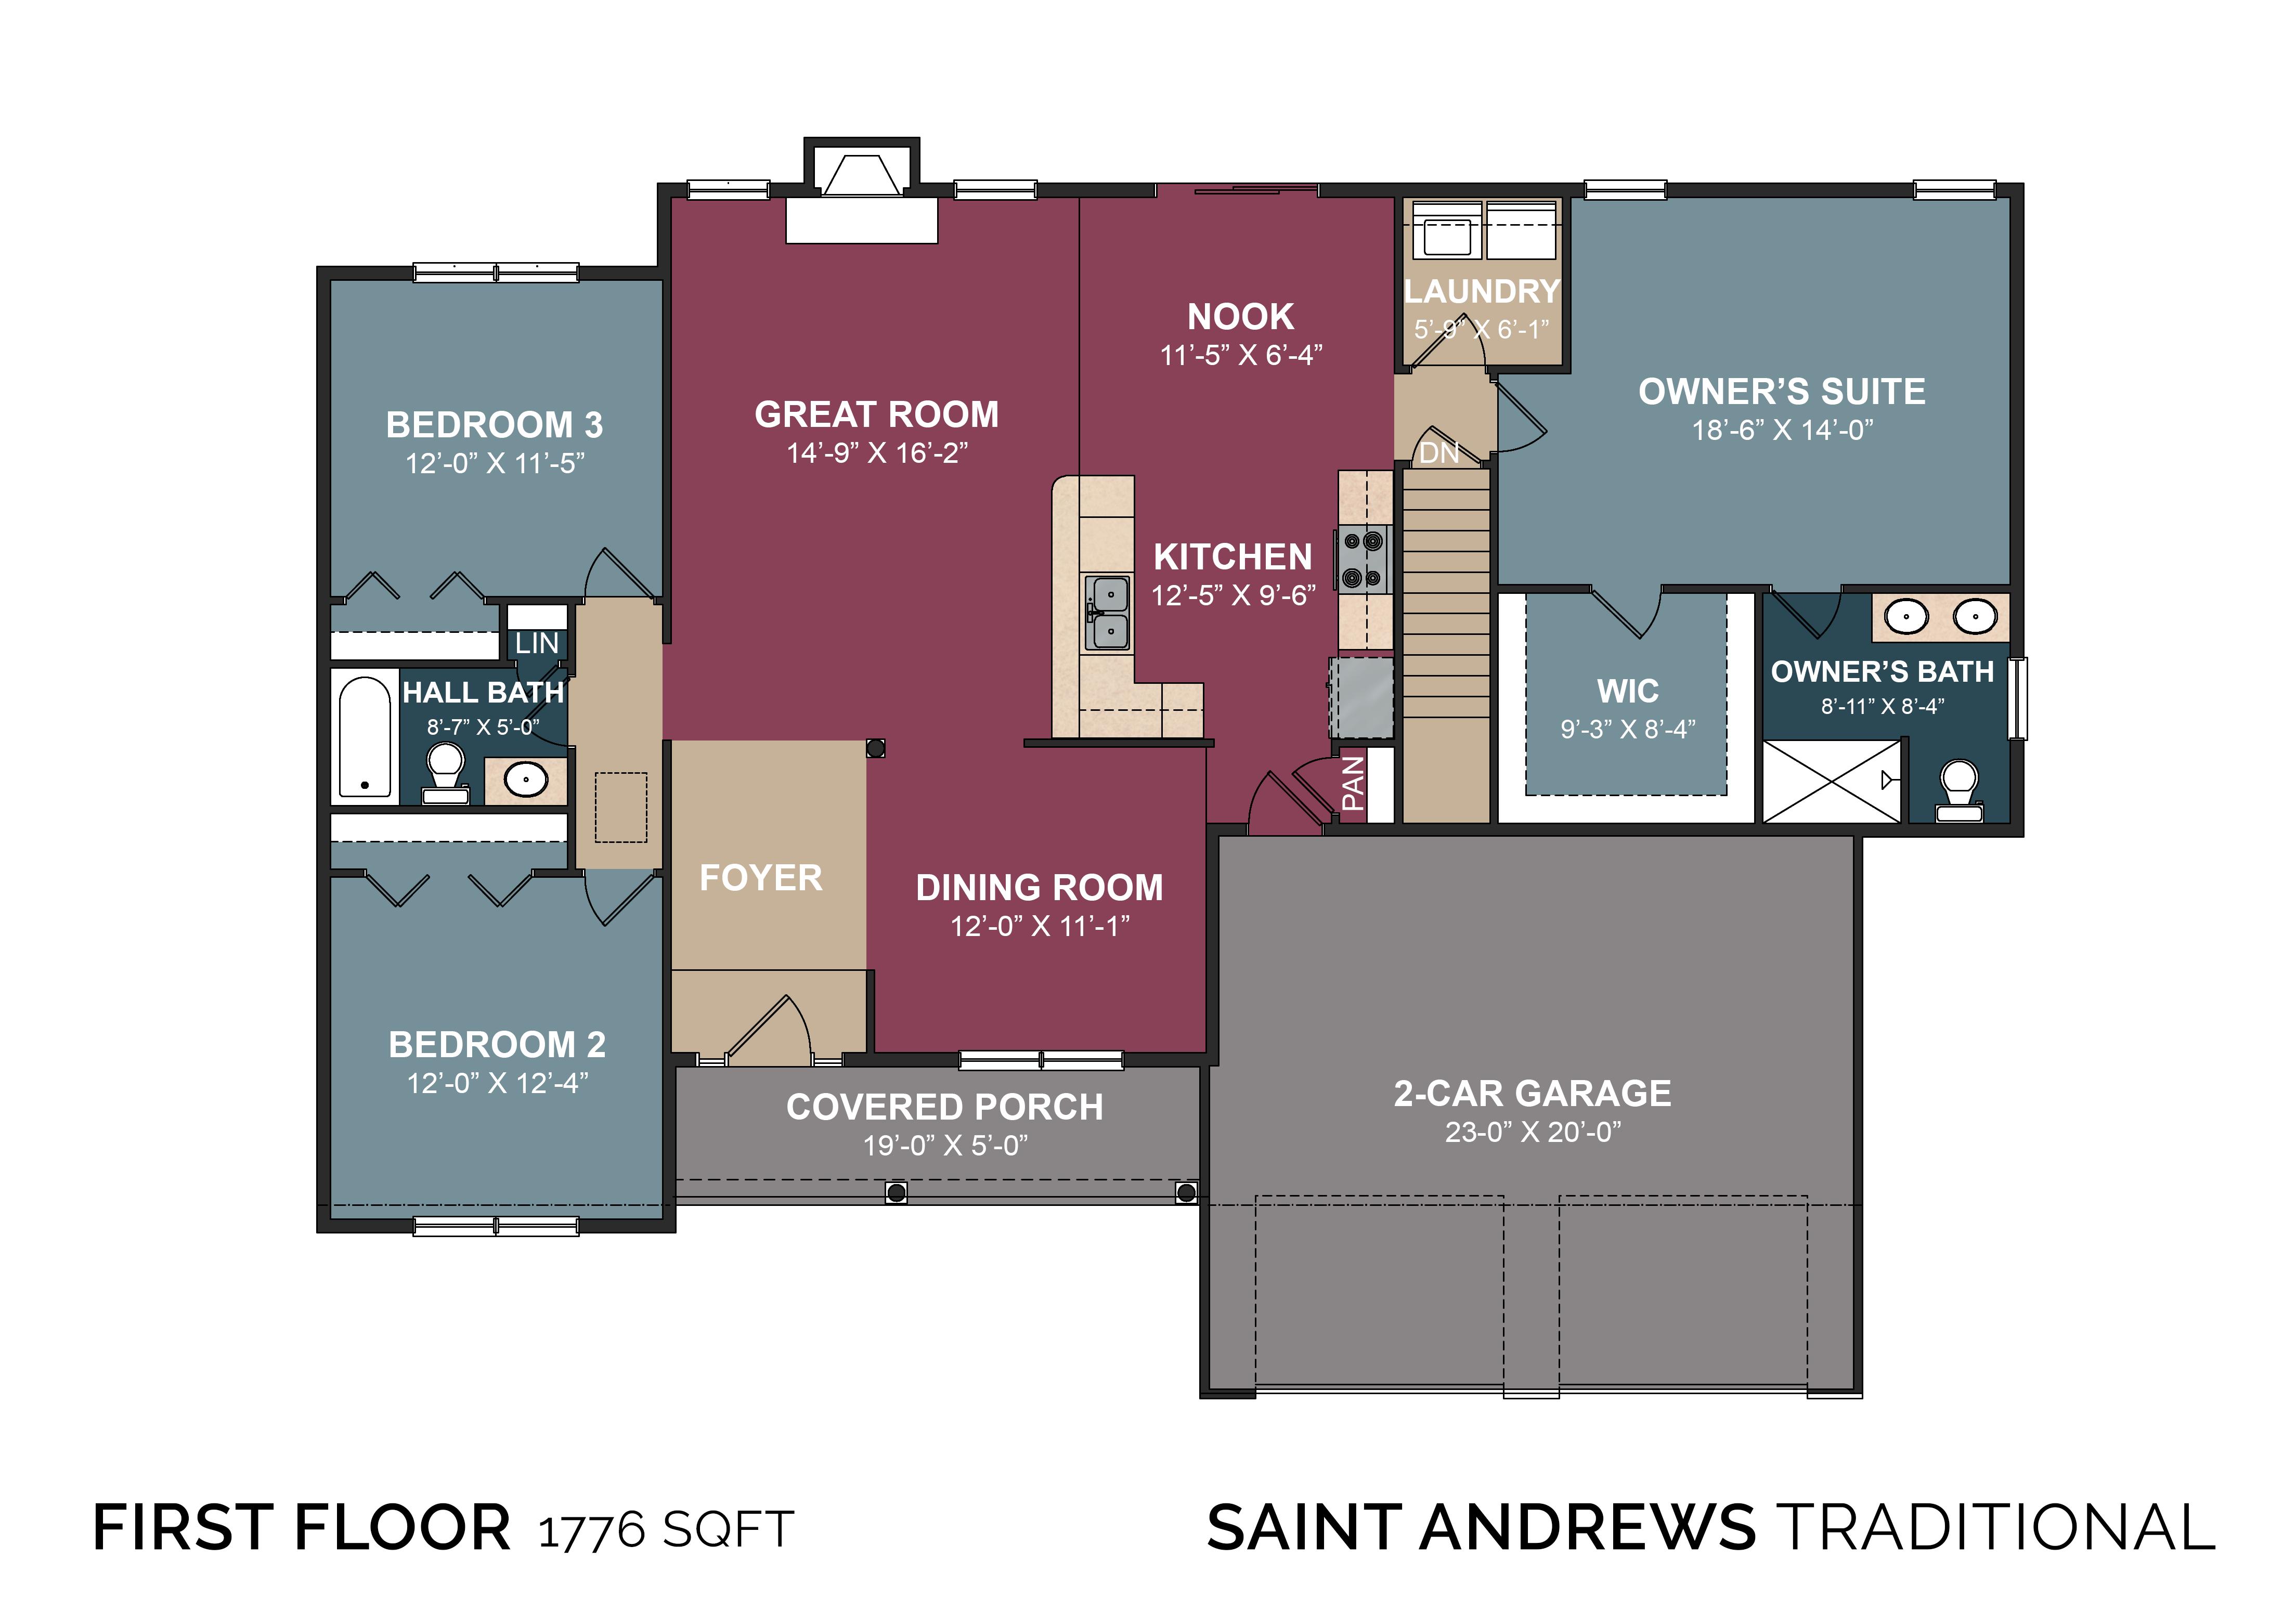 Saint-Andrews-Traditional-Brochure5